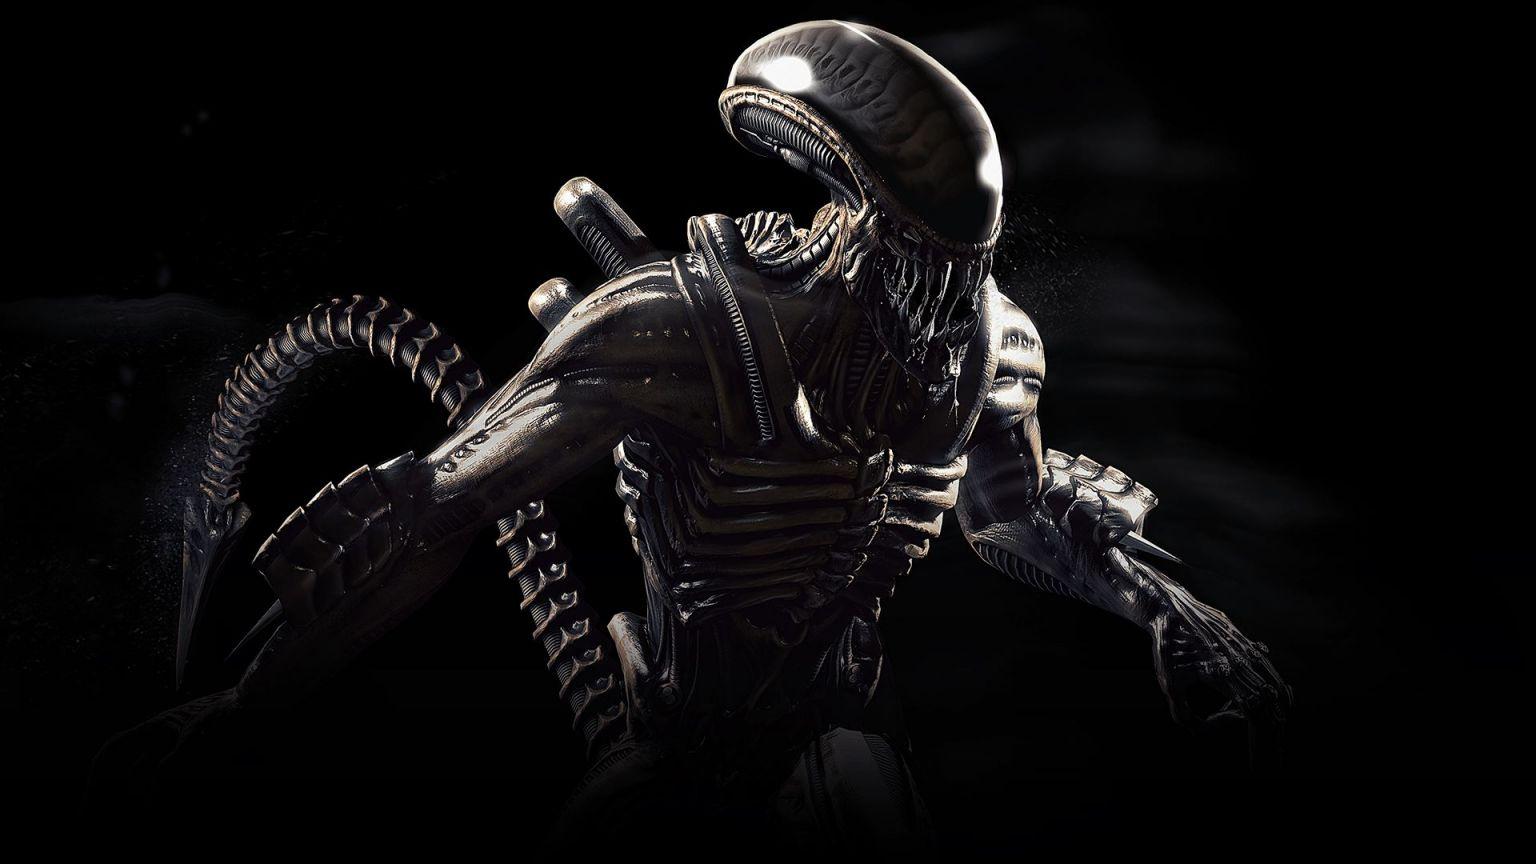 Alien Mortal Kombat X wallpaper in 1536x864 resolution 1536x864